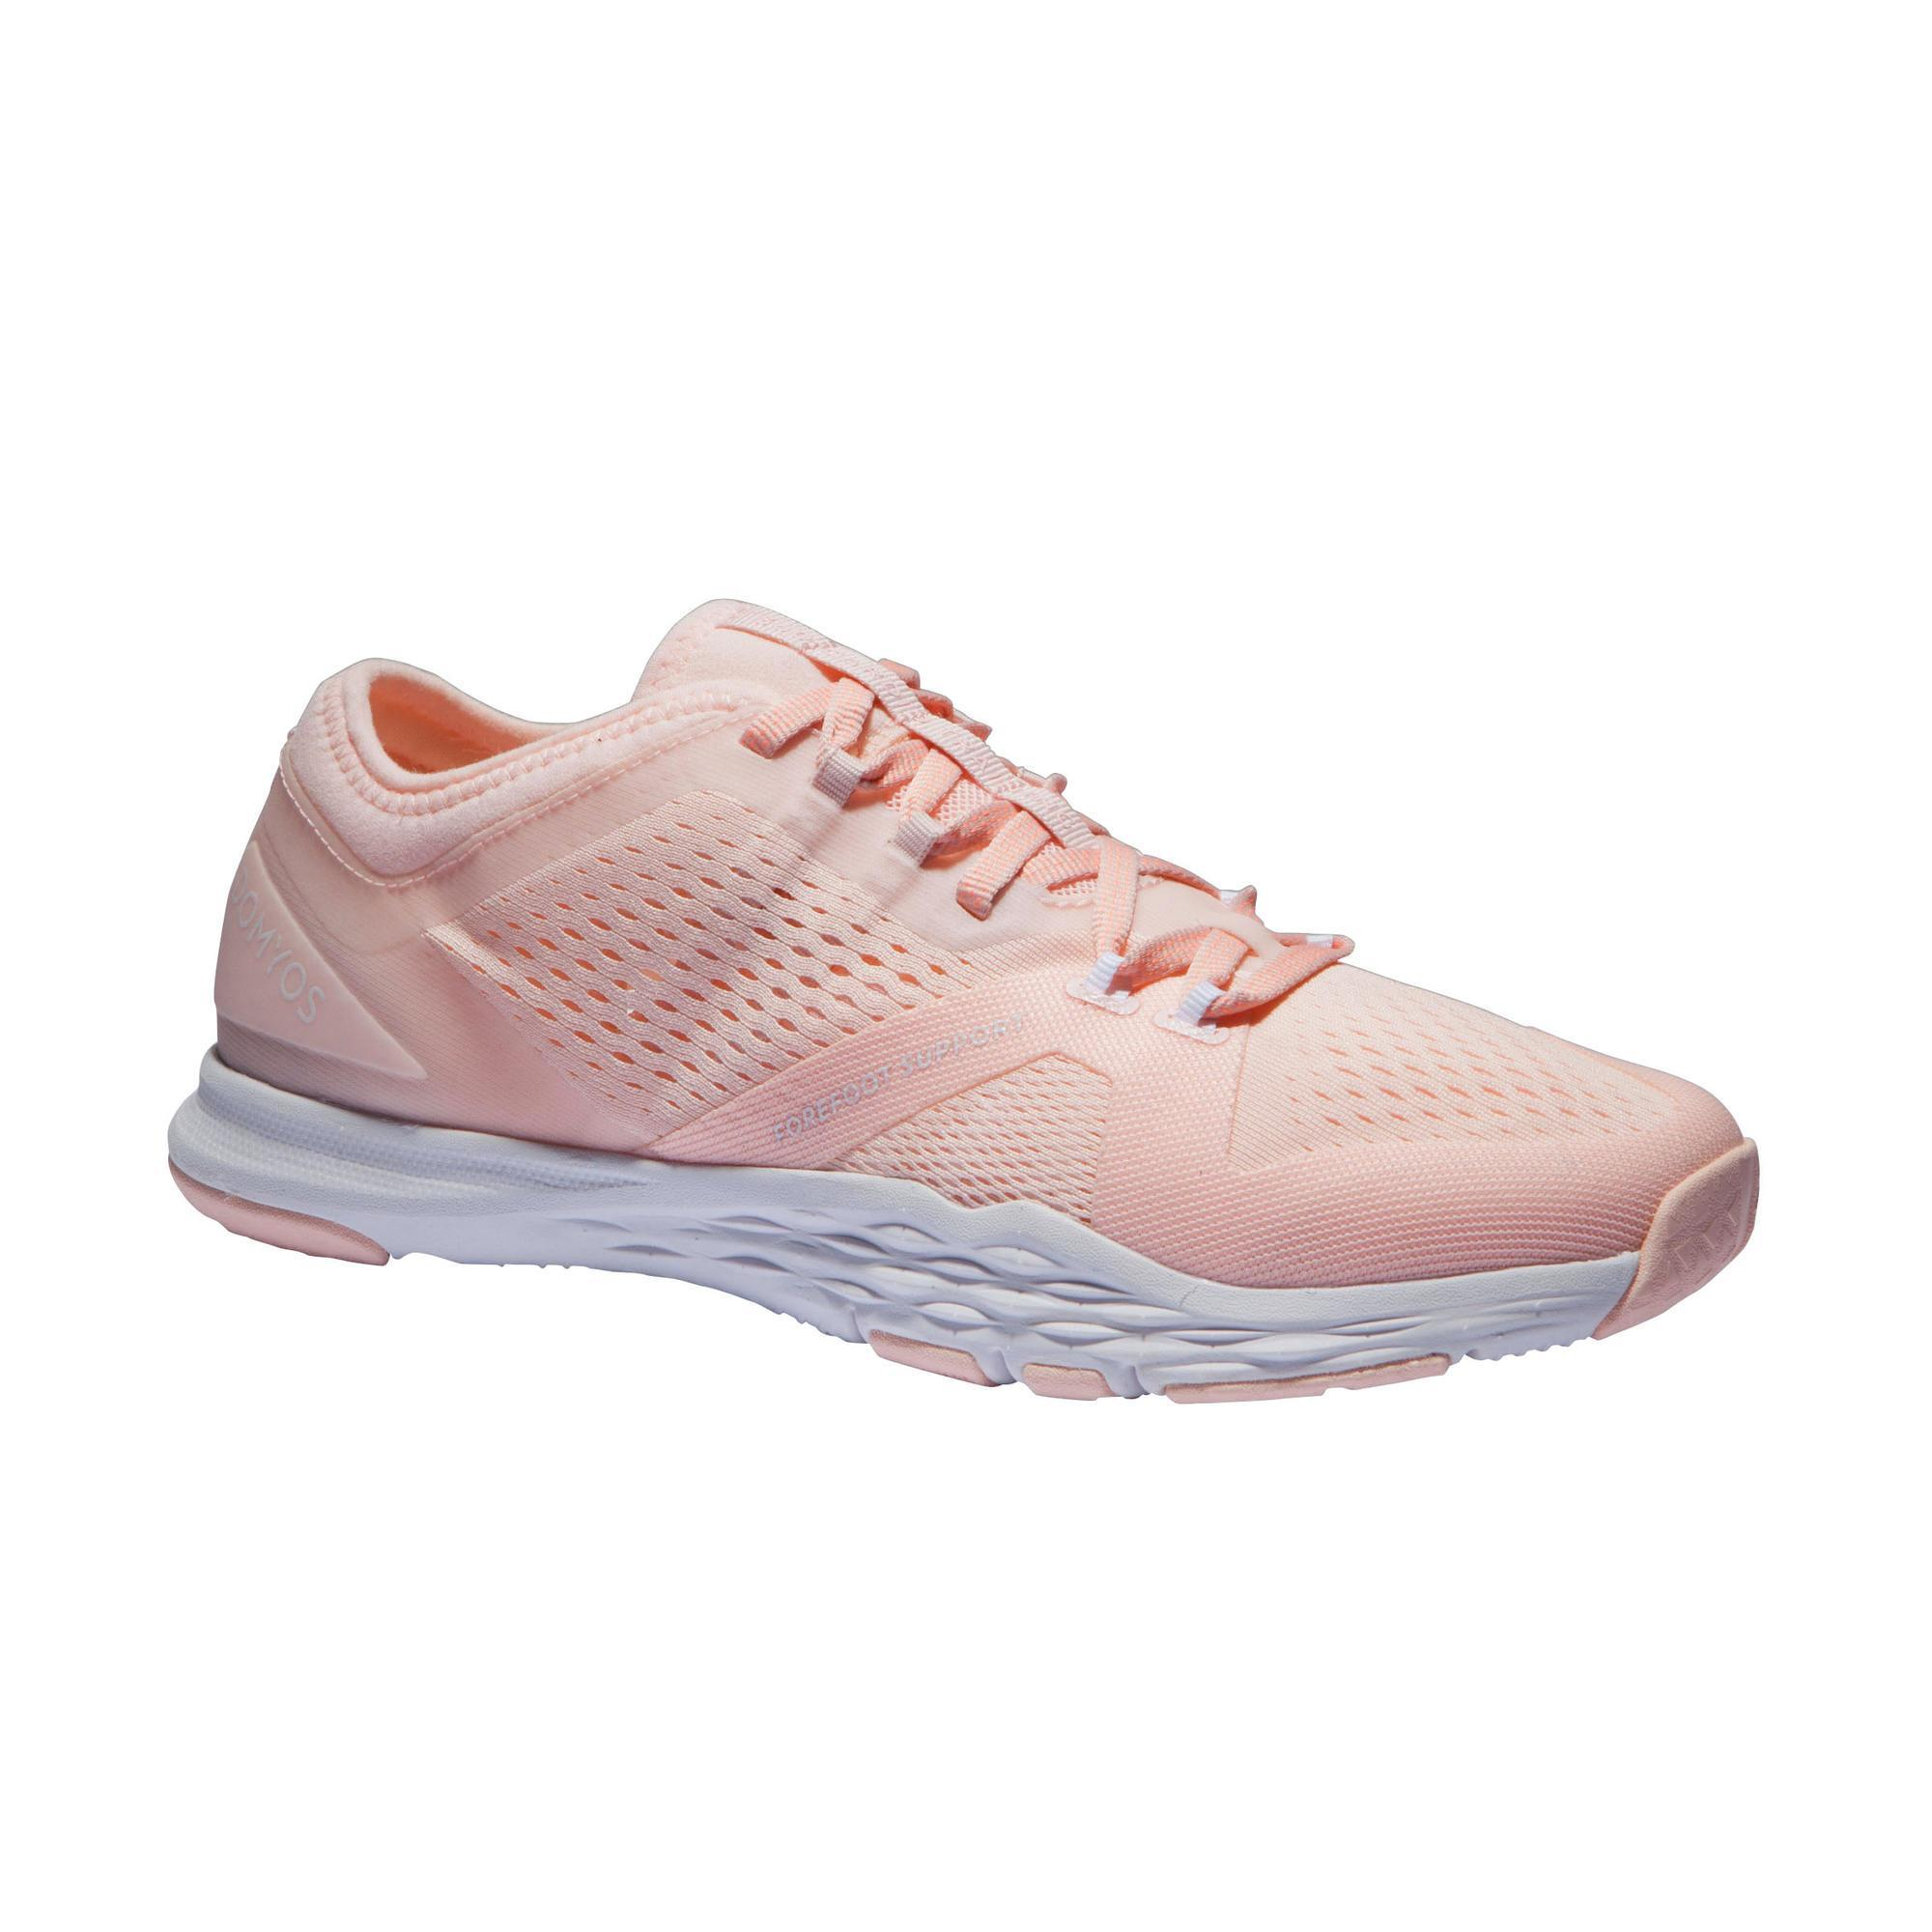 Fitnessschuhe 900 Fitness Cardio Damen   Schuhe > Sportschuhe   Domyos